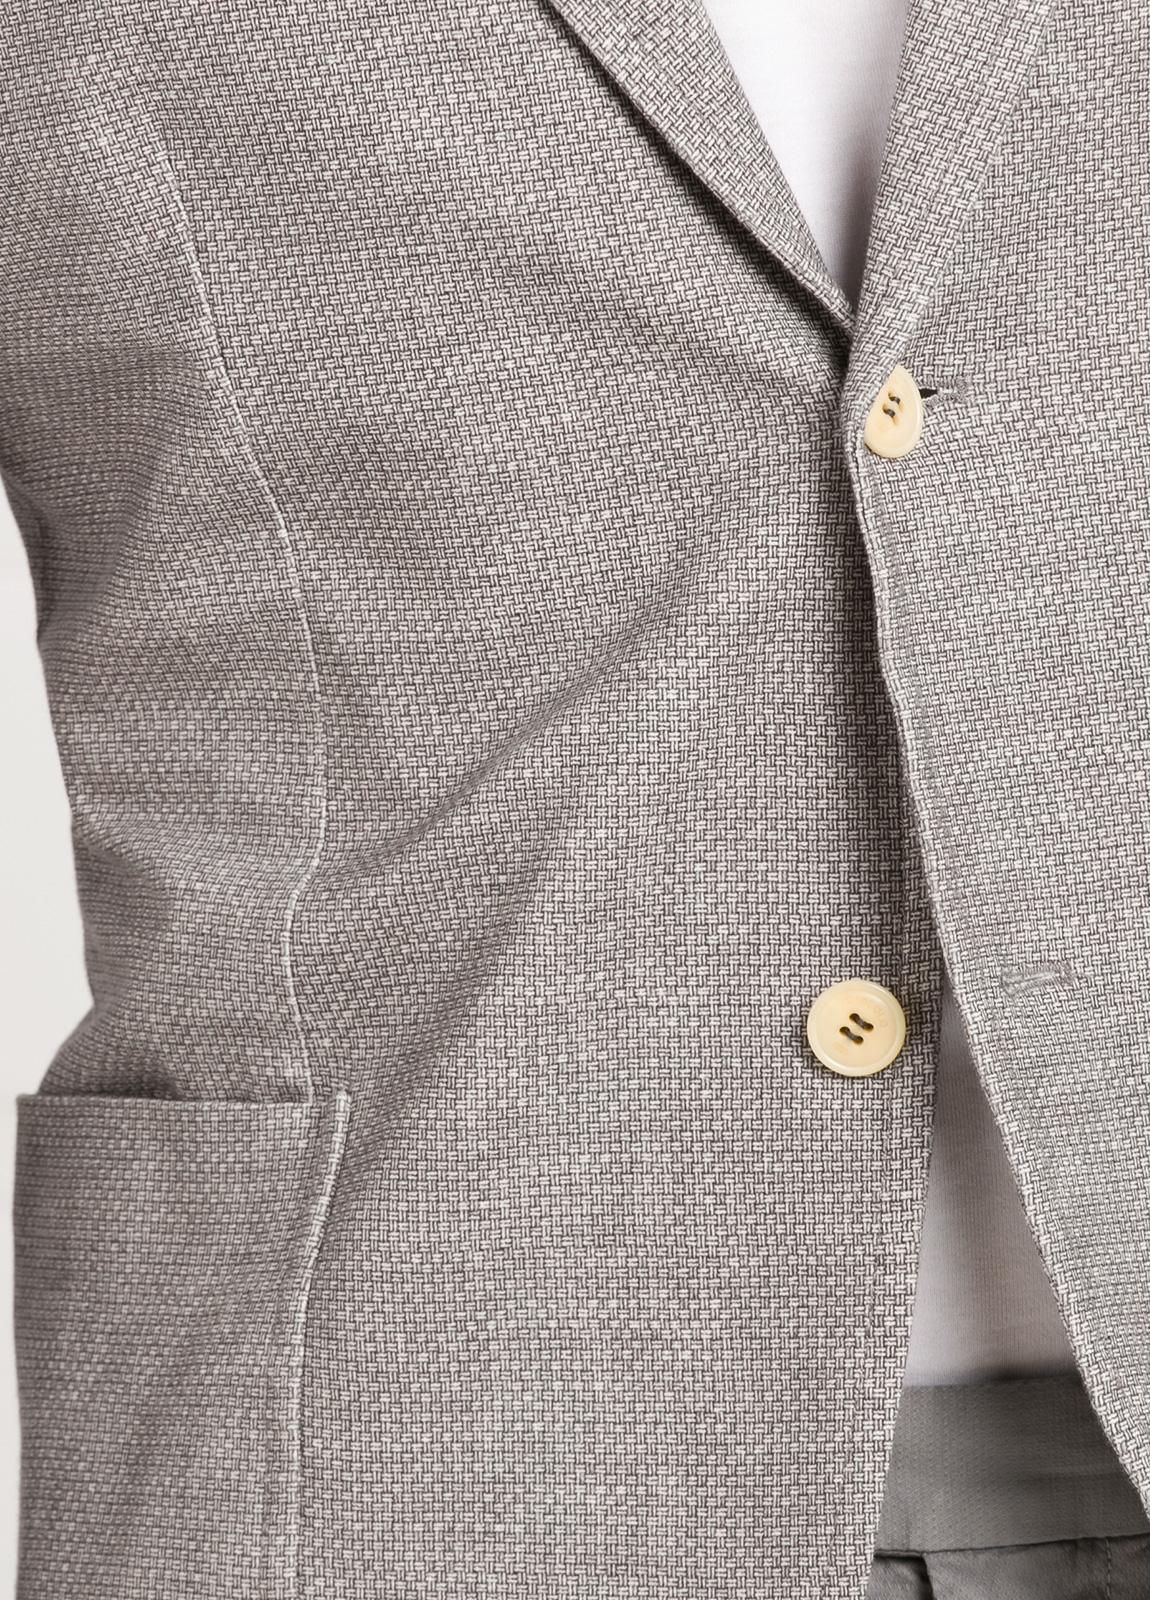 Americana soft 2 botones SLIM FIT esterilla color gris, Algodón. - Ítem2